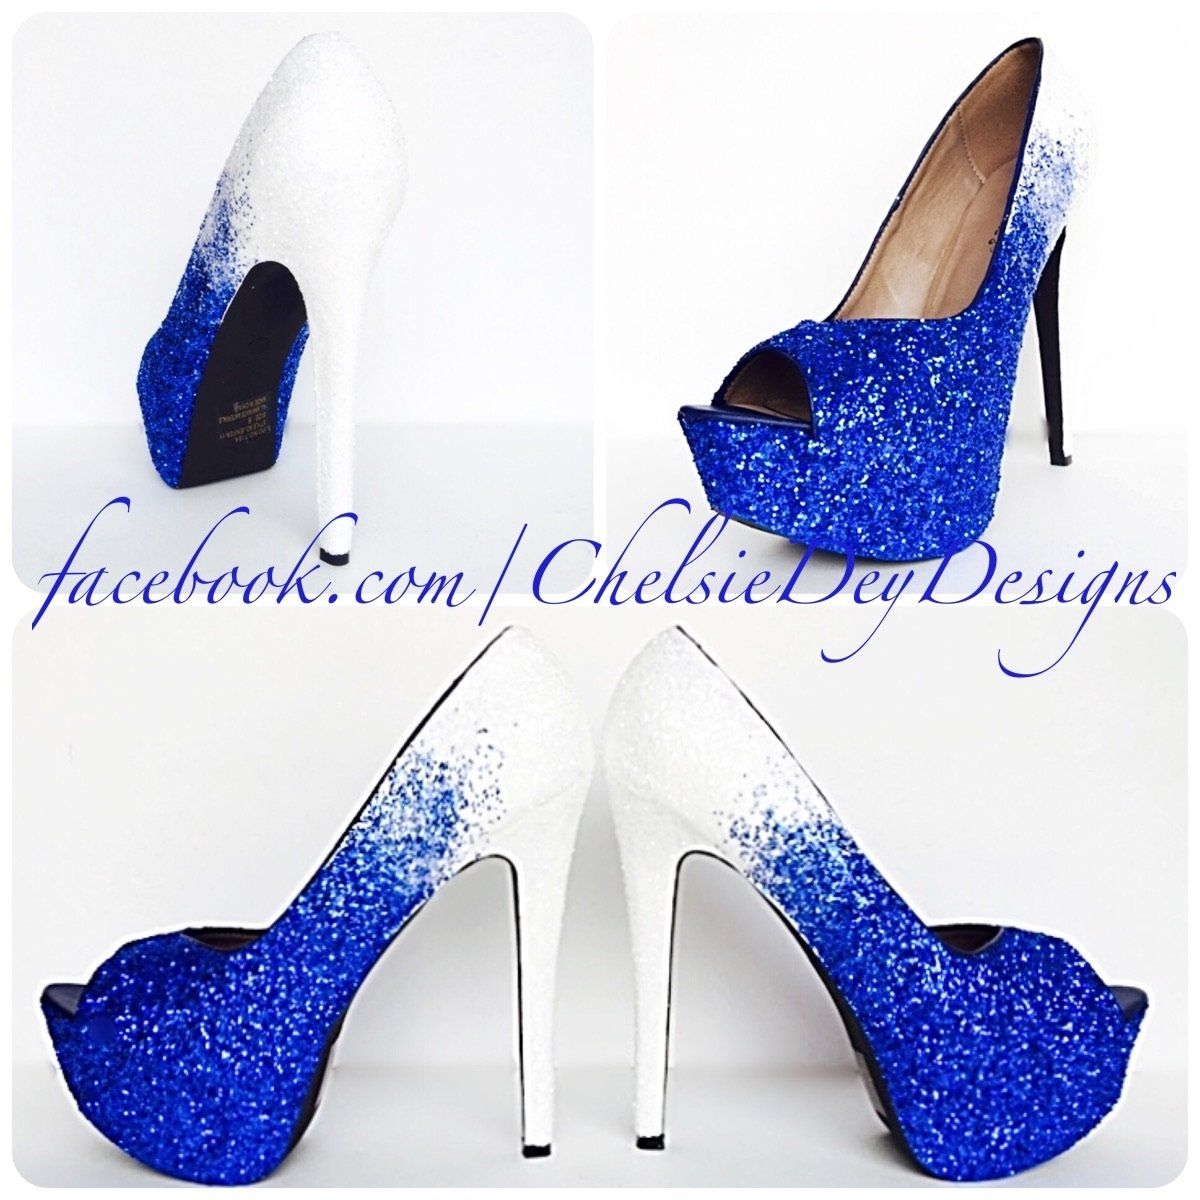 Glitter Peep Toe Pumps Something Blue Ombre Wedding Open Toe High Heel Wedding Shoes Blue Heels Wedding Shoes White Pumps Blue Heels